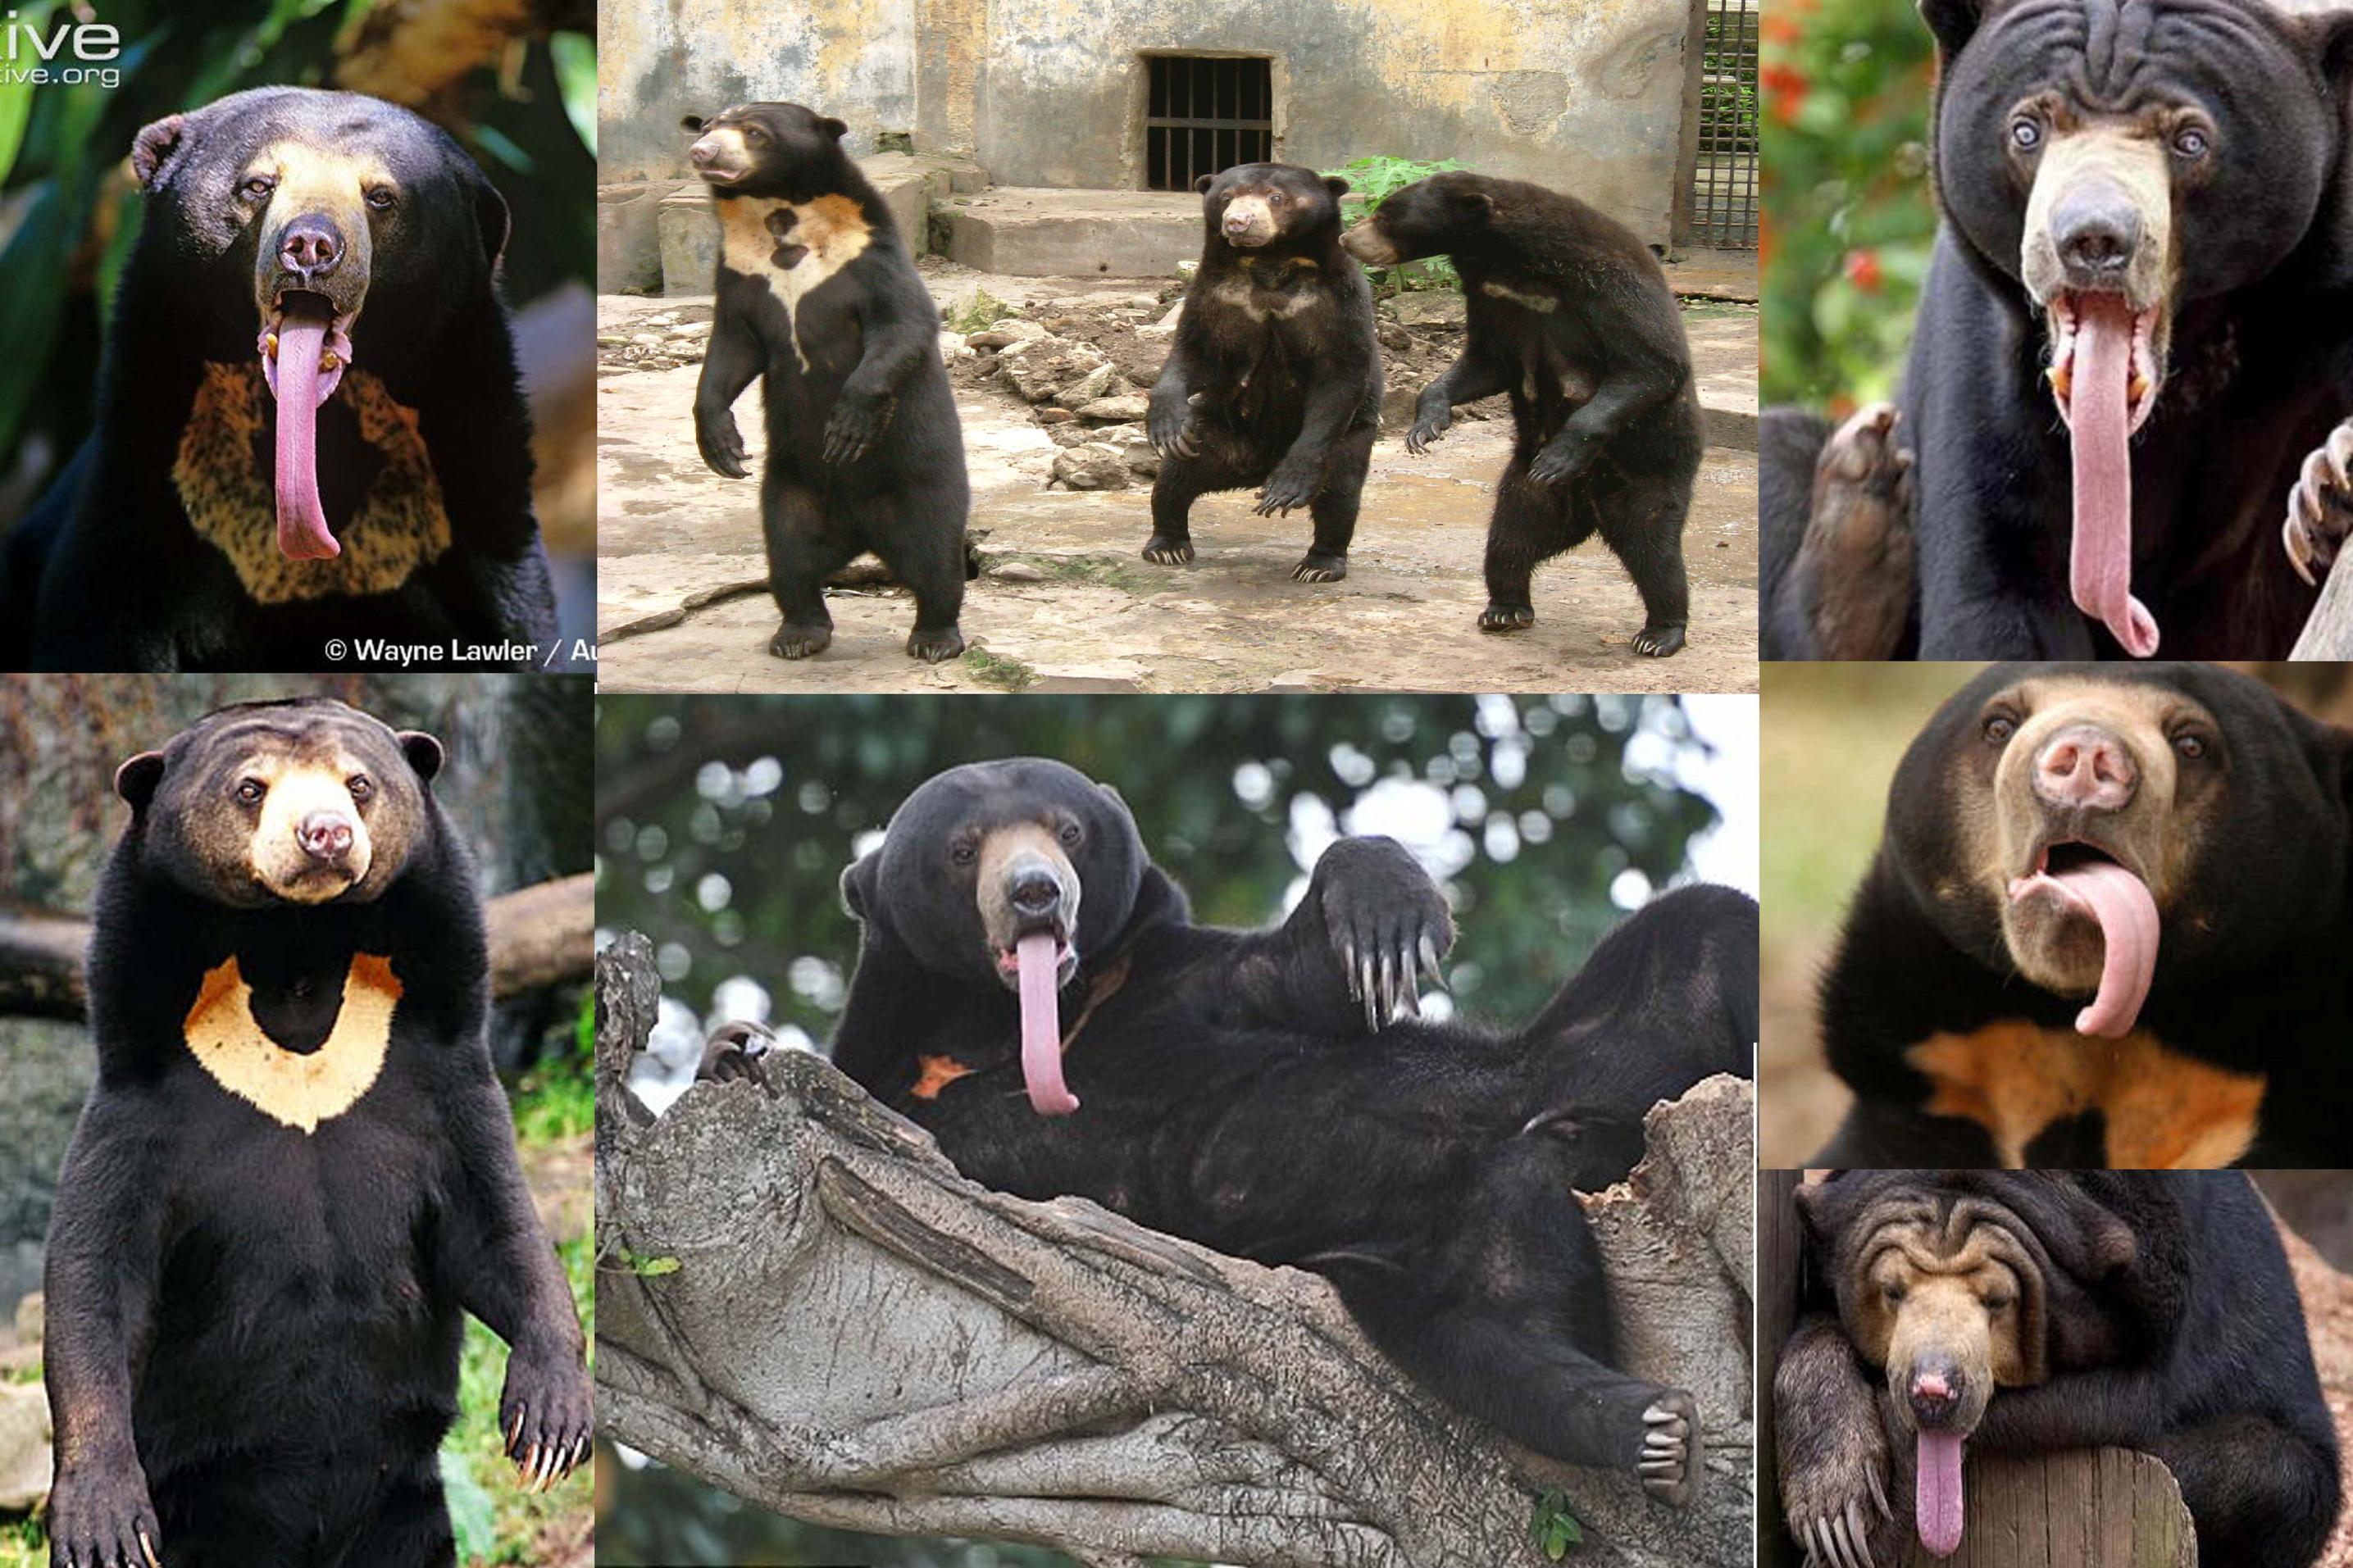 The Confession Bear Meme Is a Malayan Sun Bear